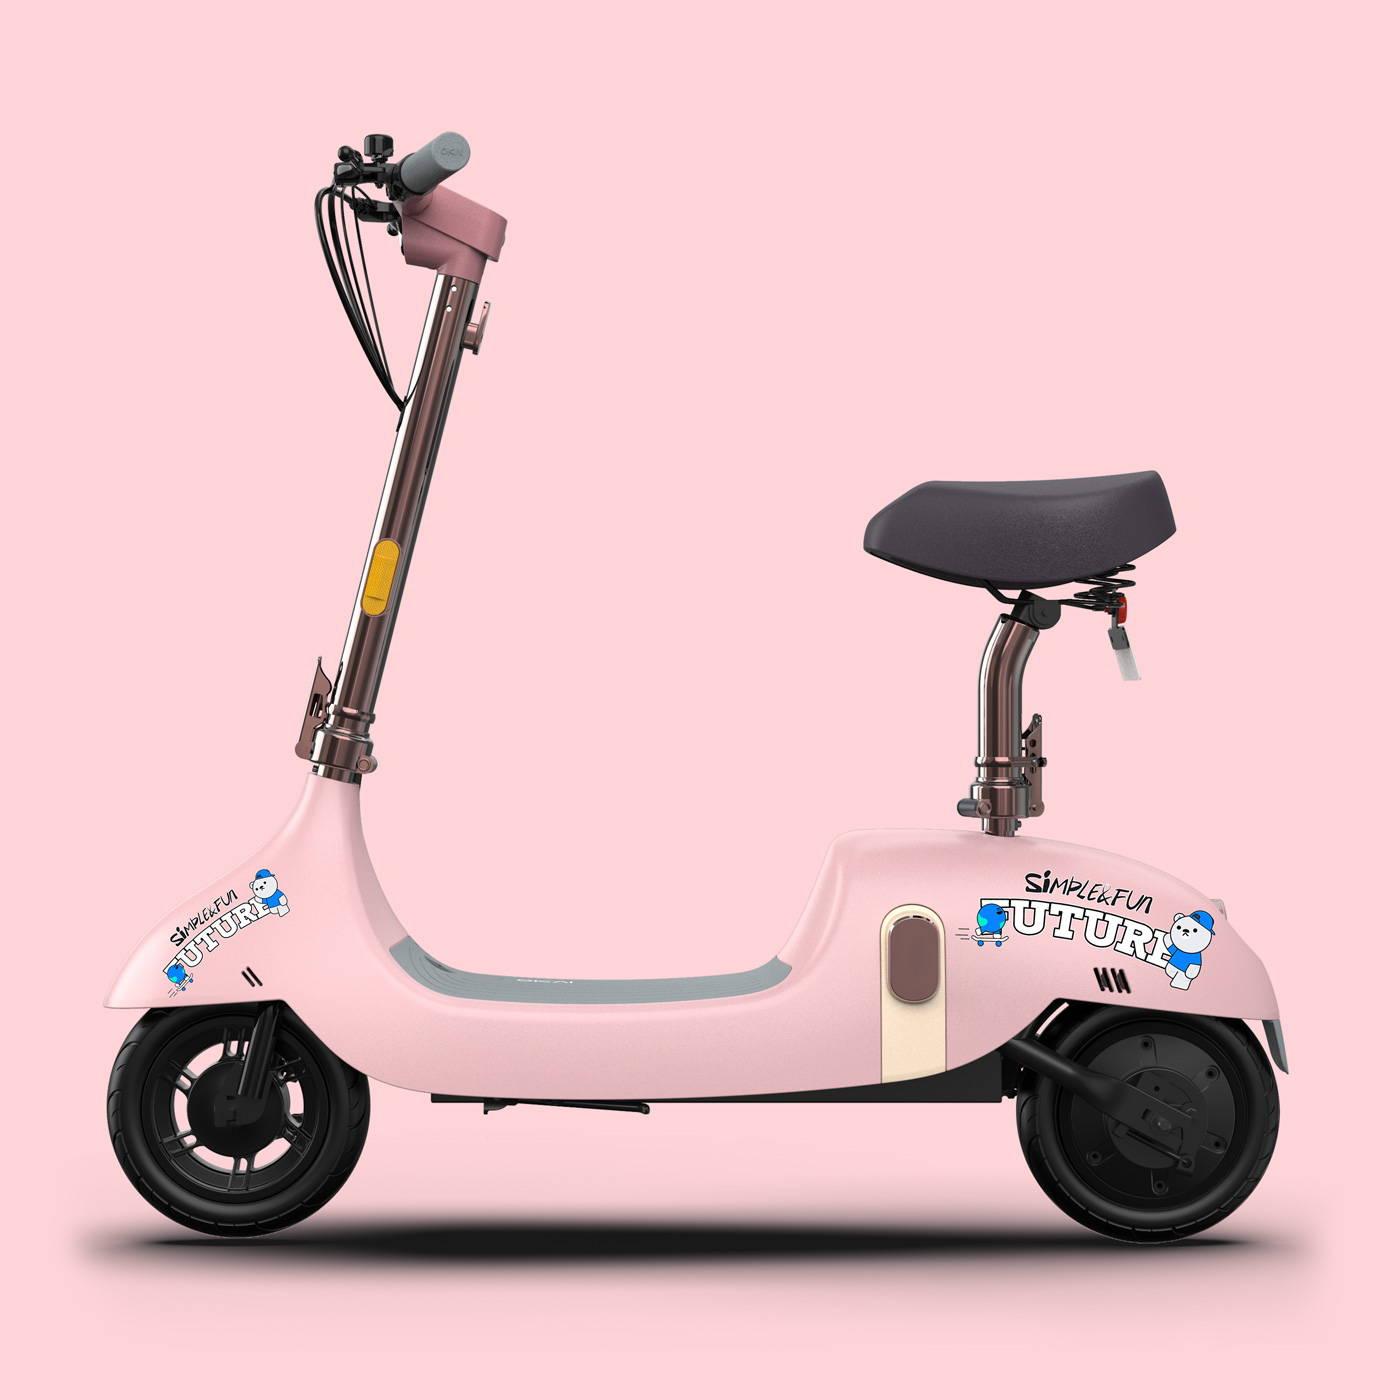 okai ea10 escooter decals stickers customize